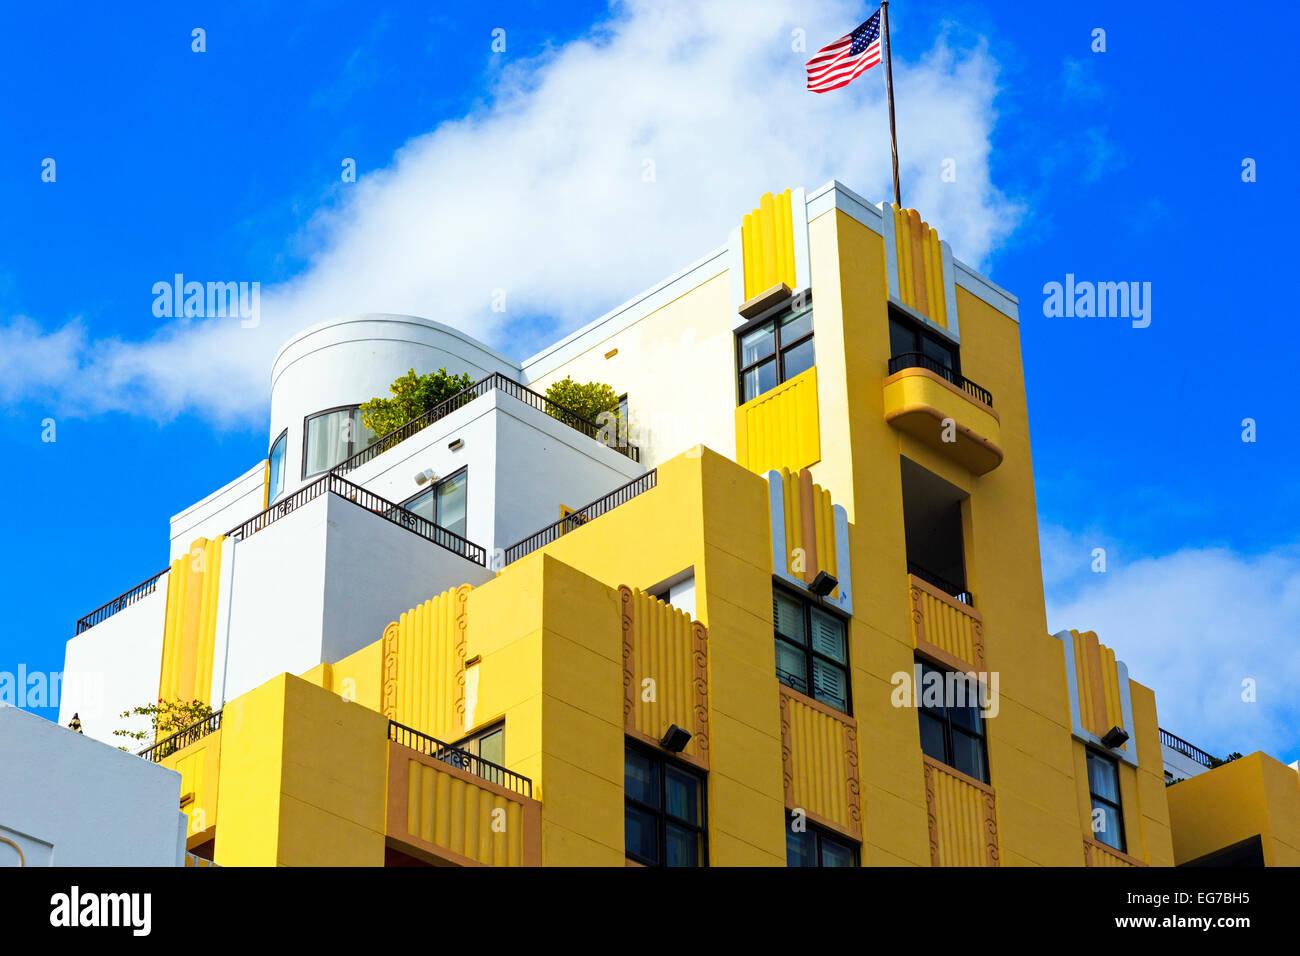 Art Deco building design on Ocean Drive, South Beach Miami, Florida, USA - Stock Image